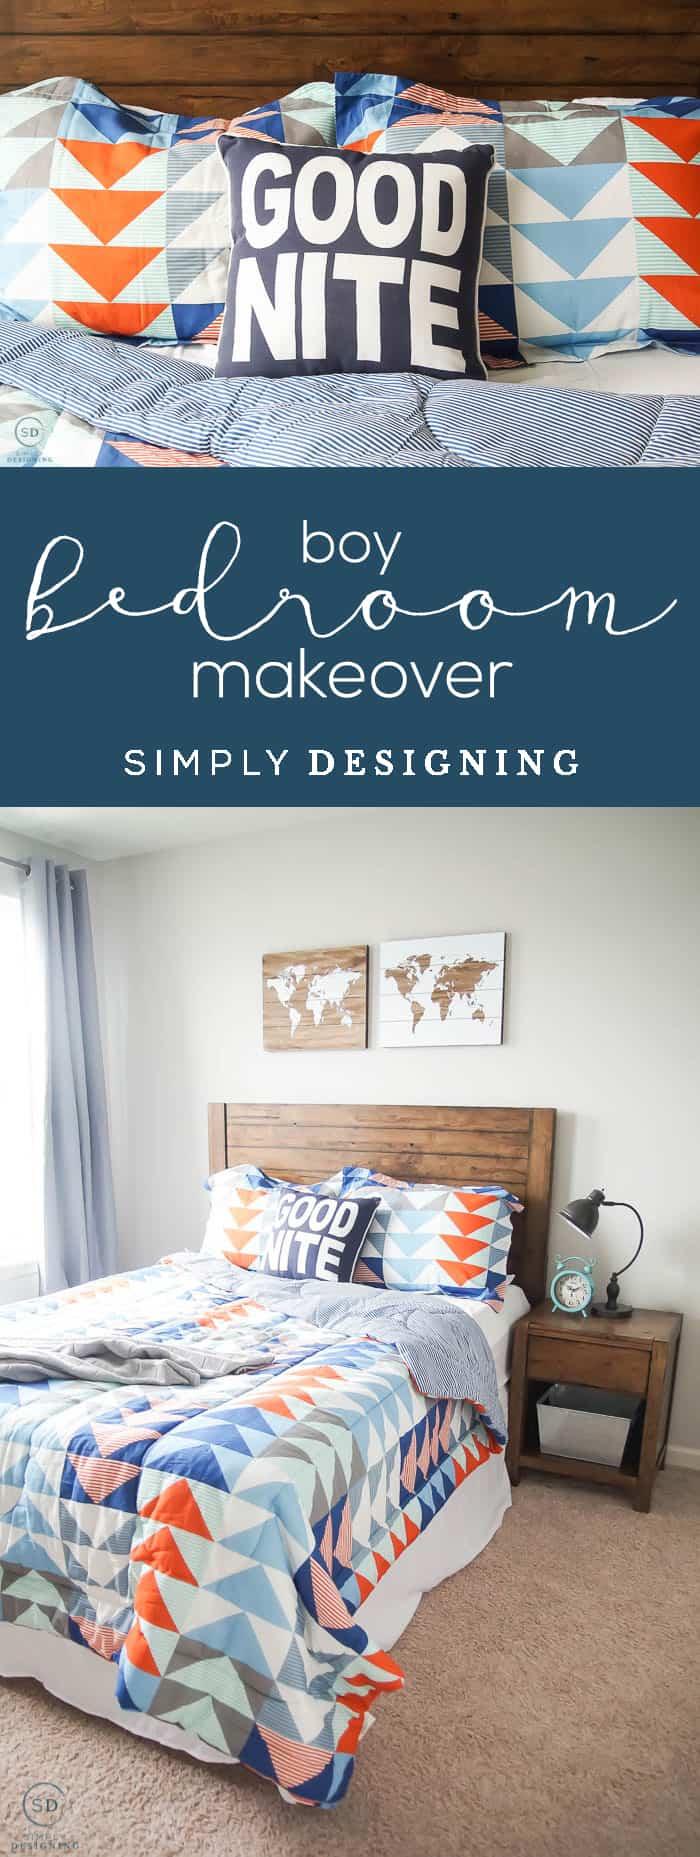 Easy and Cool Boy Bedroom Idea - Boy Bedroom Makeover - boy bedroom idea on a budget - awesome boy bedroom idea - #ad #BHGLiveBetter #BHGatWalmart @BHGLiveBetter @walmart